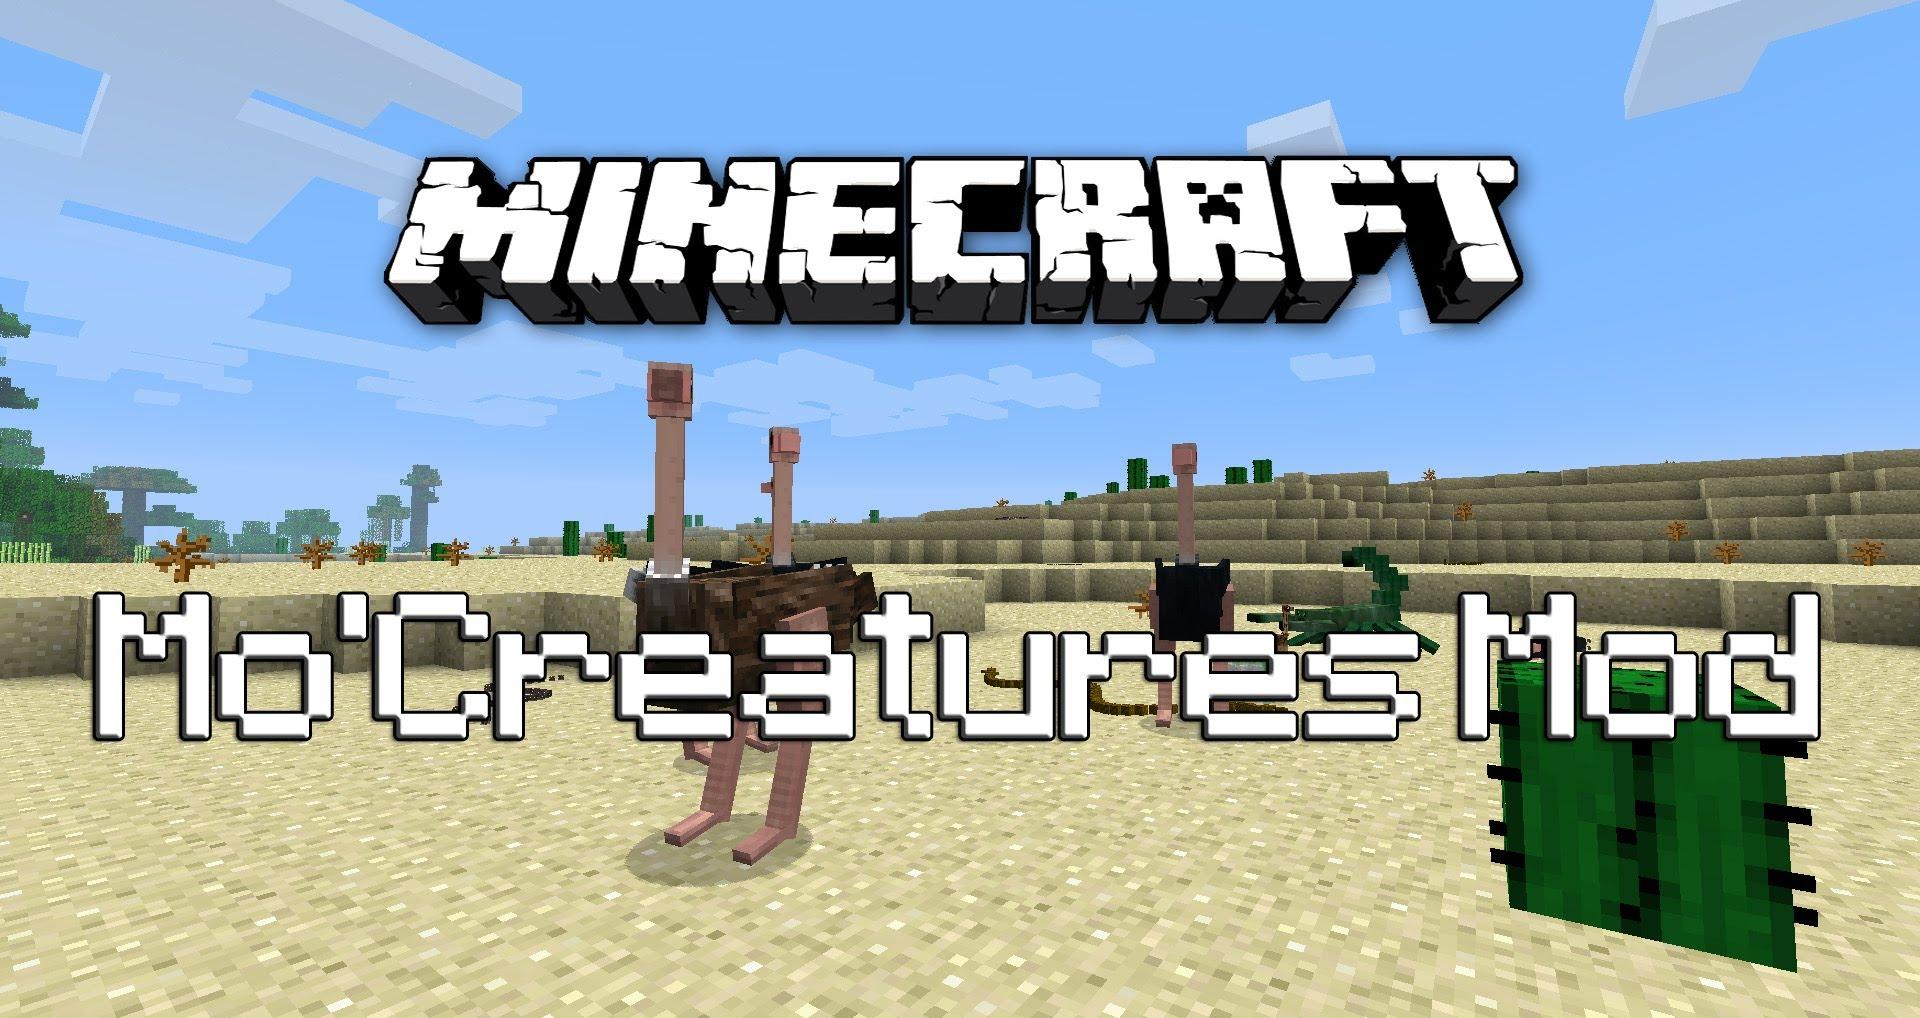 Mo Creatures Mod For Minecraft 11311221112 Minecraftred